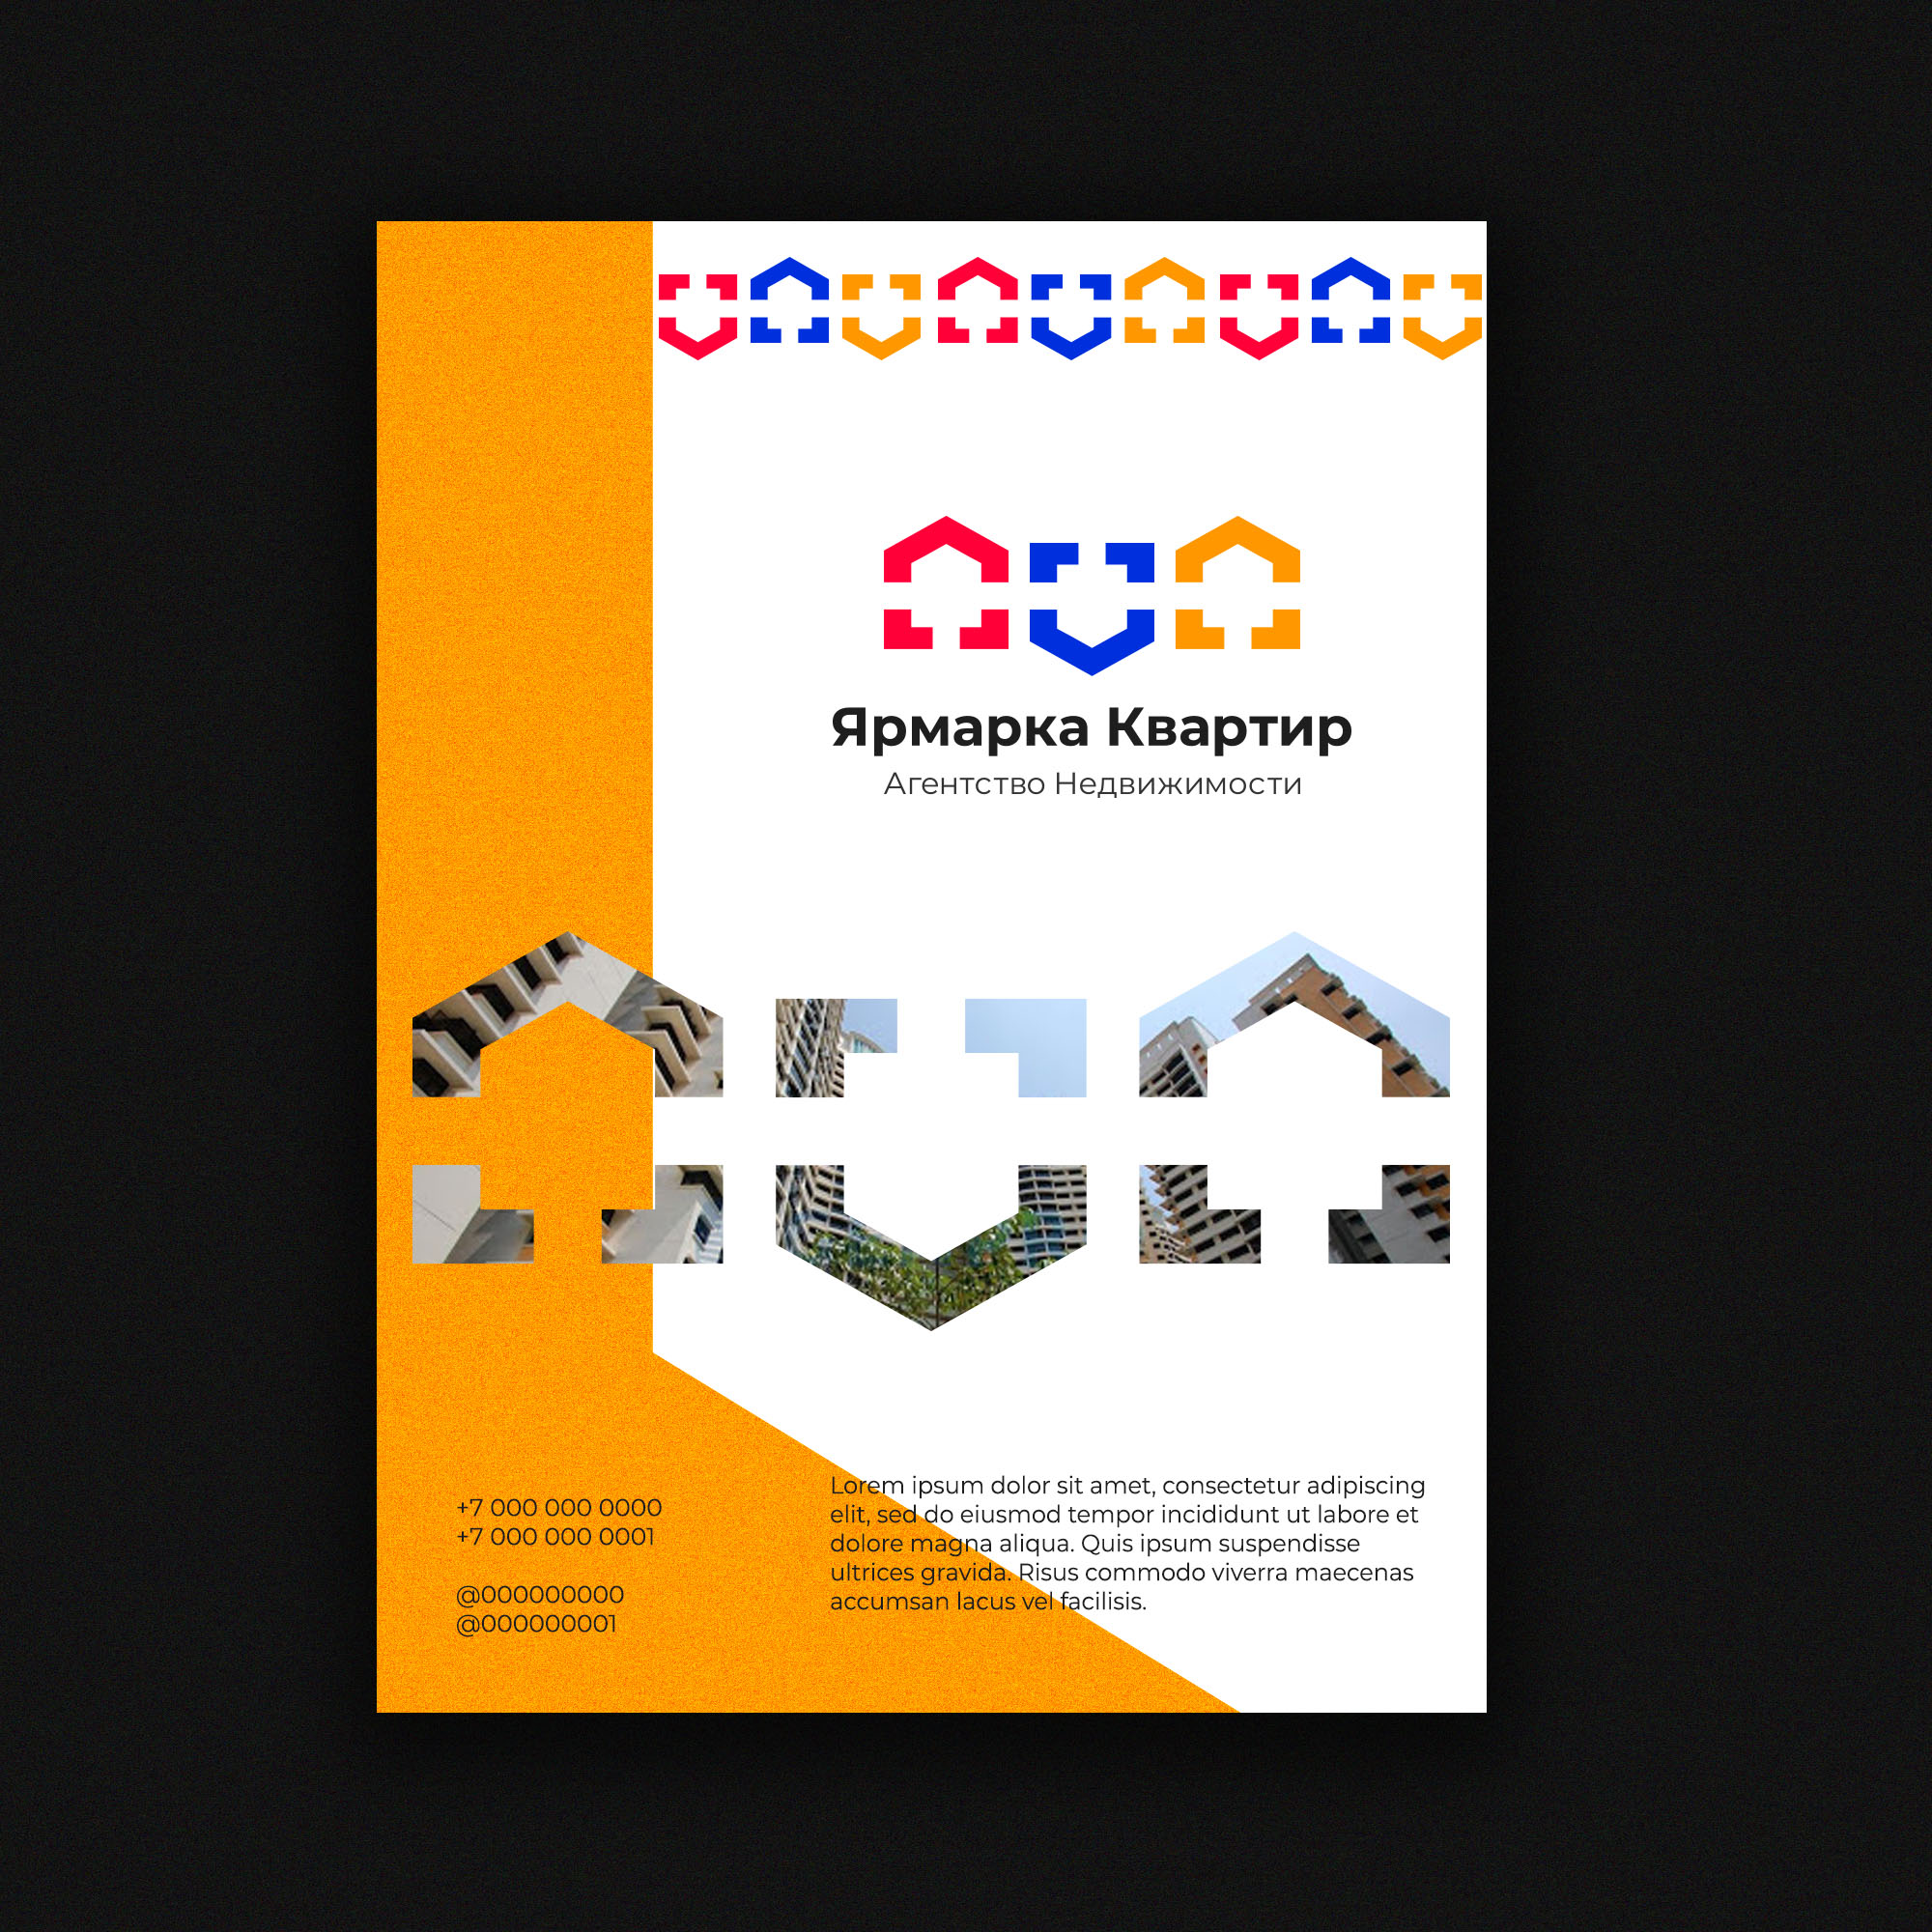 Создание логотипа, с вариантами для визитки и листовки фото f_44660084a63cb7d5.jpg